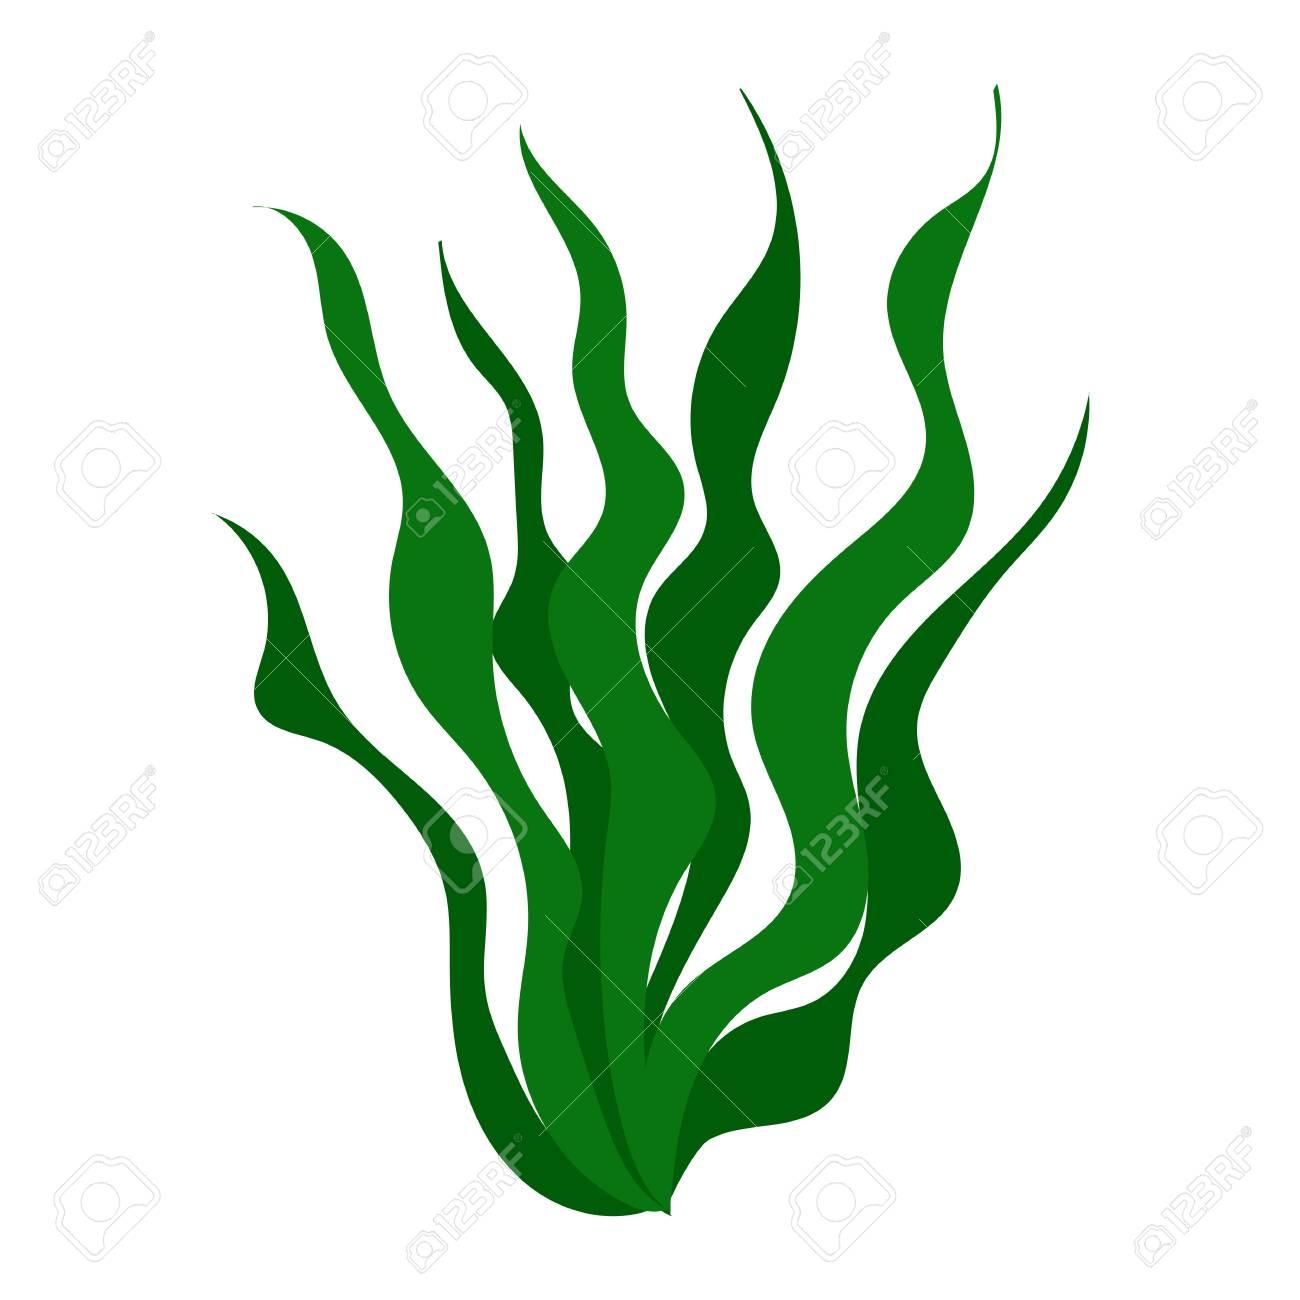 jpg free download Green isolated illustration on. Algae clipart algea.